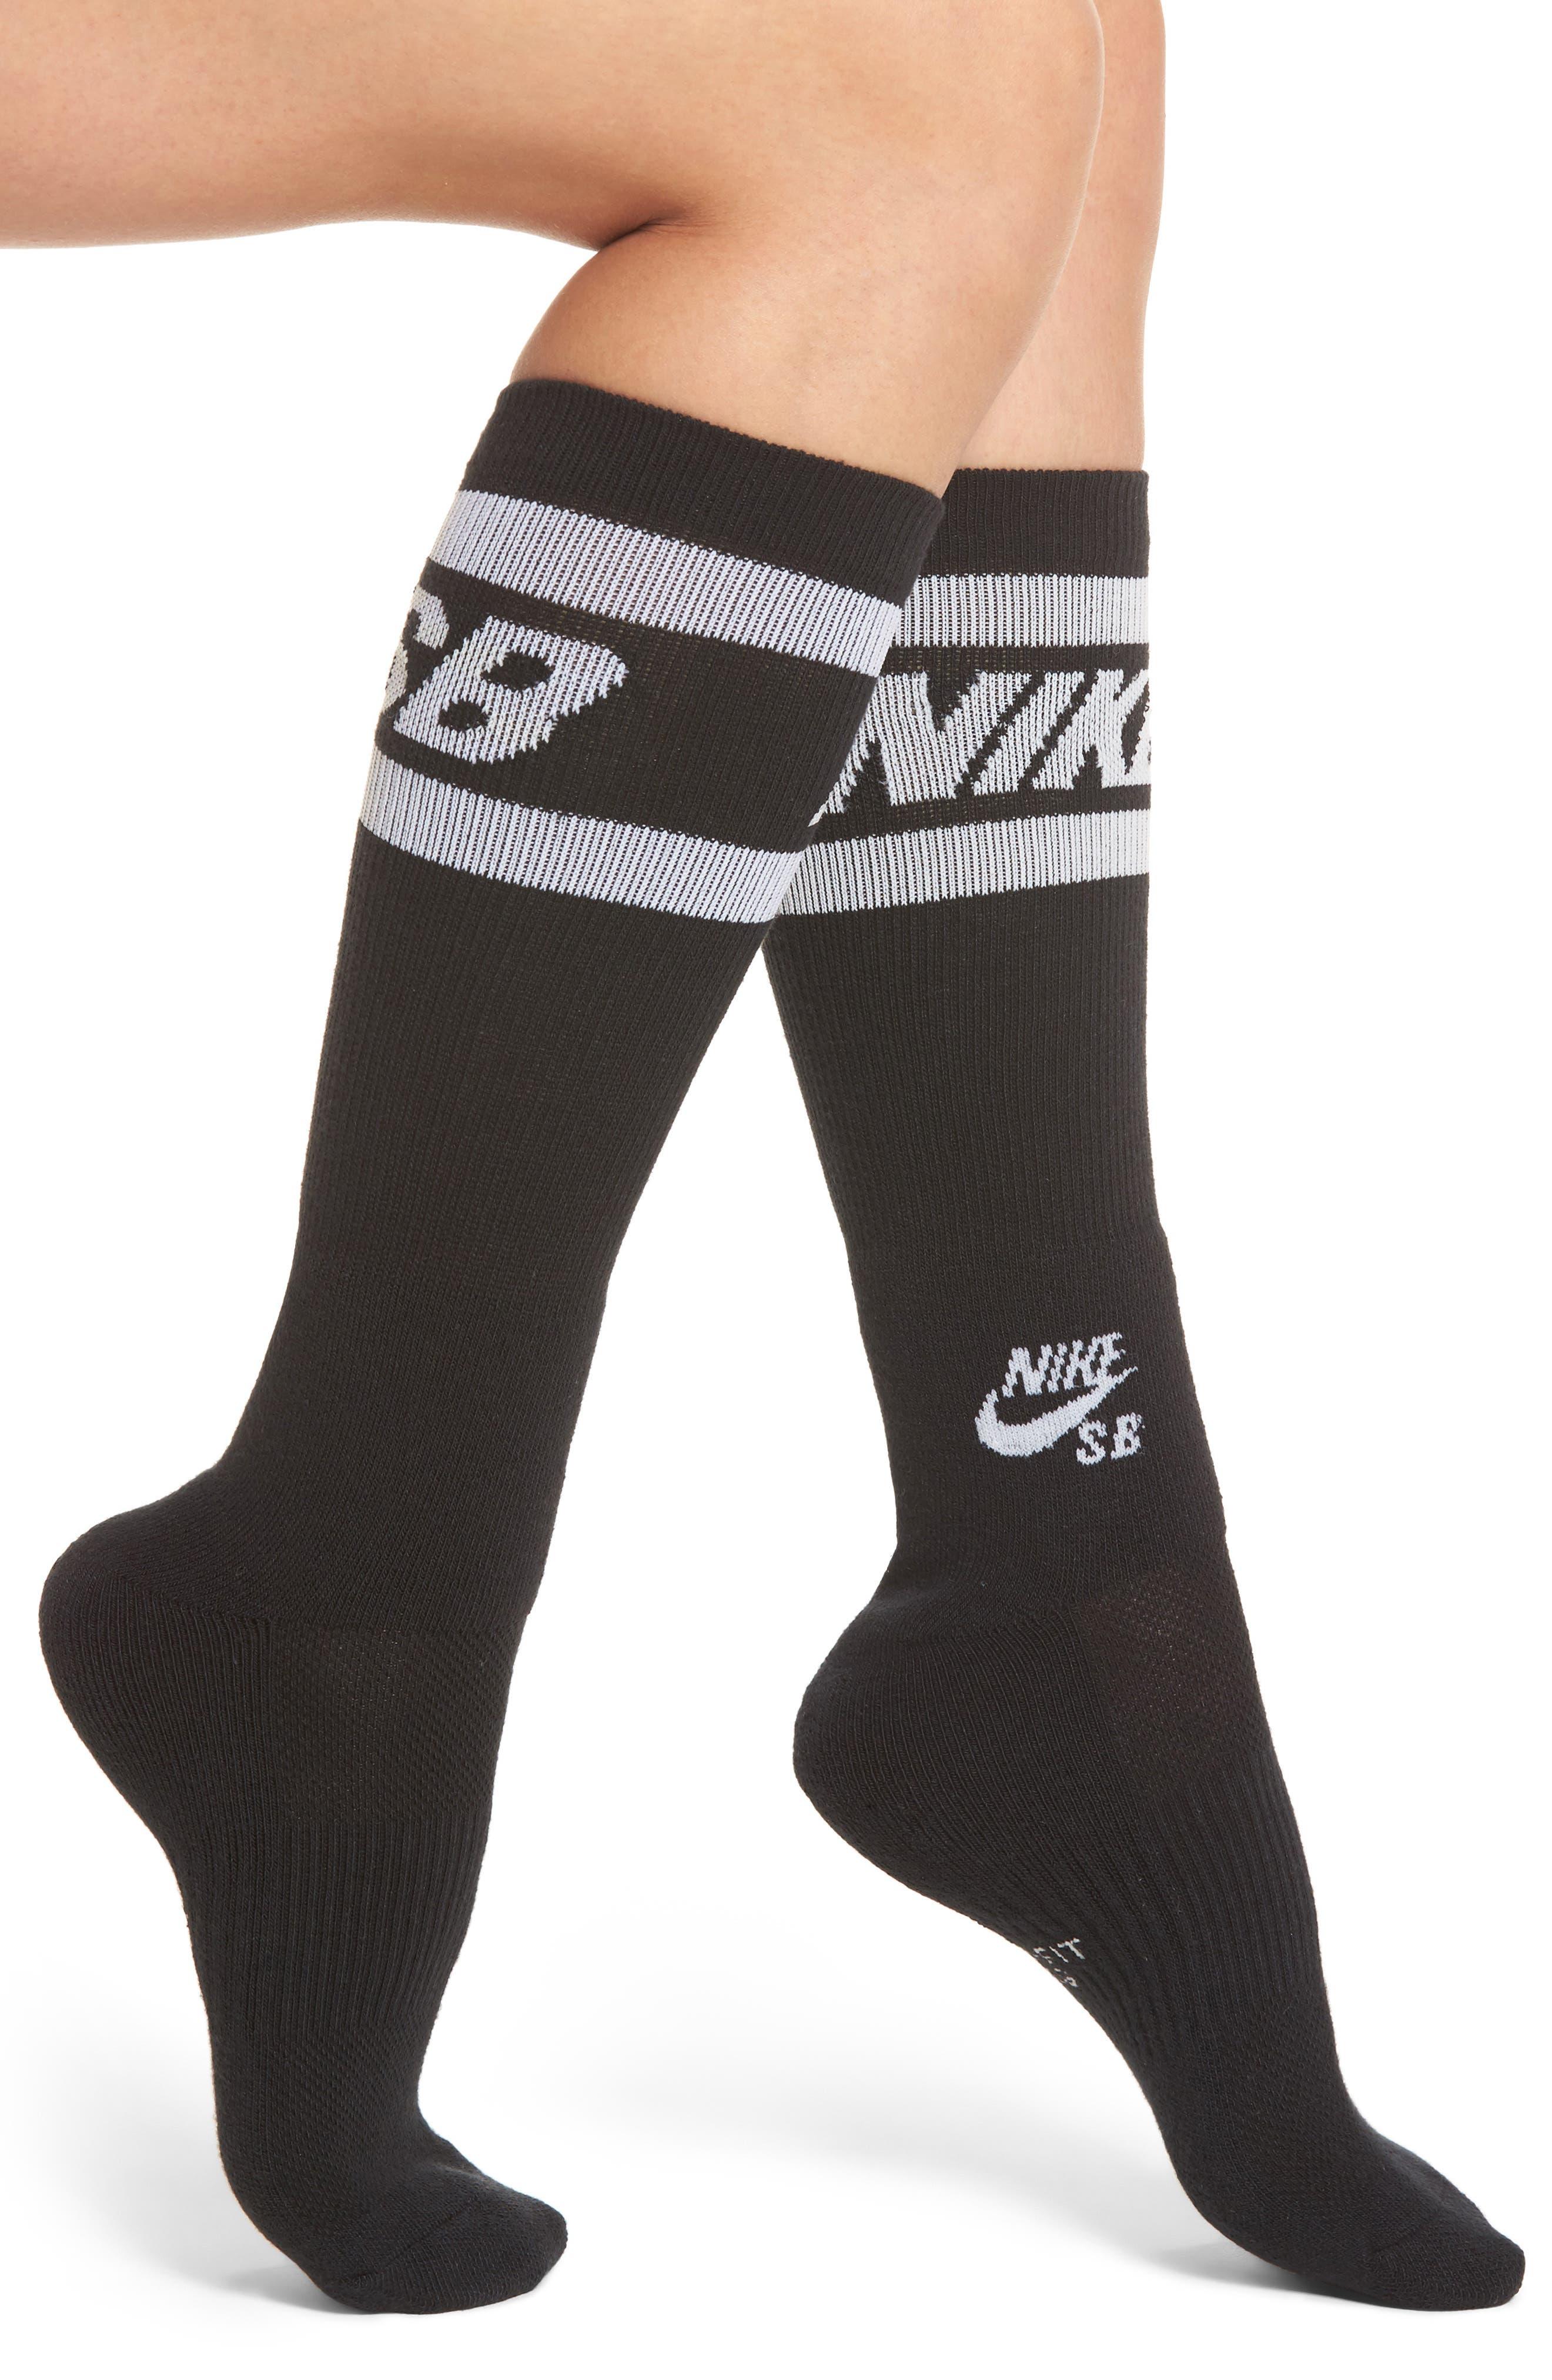 Main Image - Nike Skateboard Crew Socks